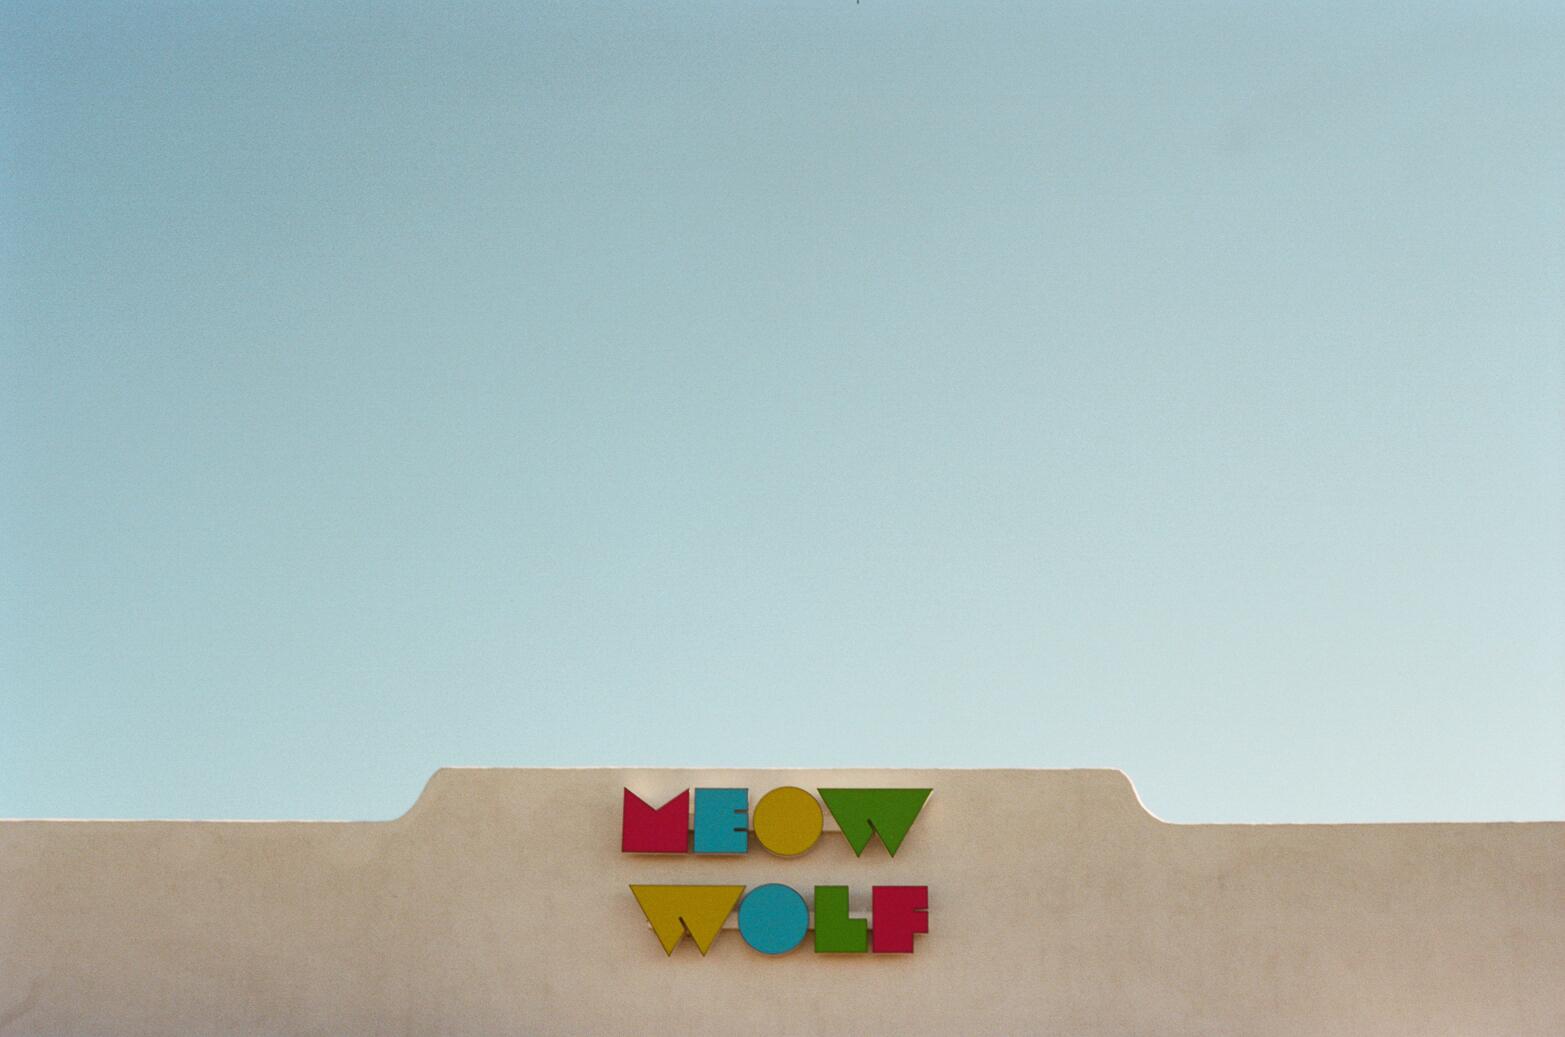 road-trip-santa-fe-new-mexico-meow-wolf-portra-160-1